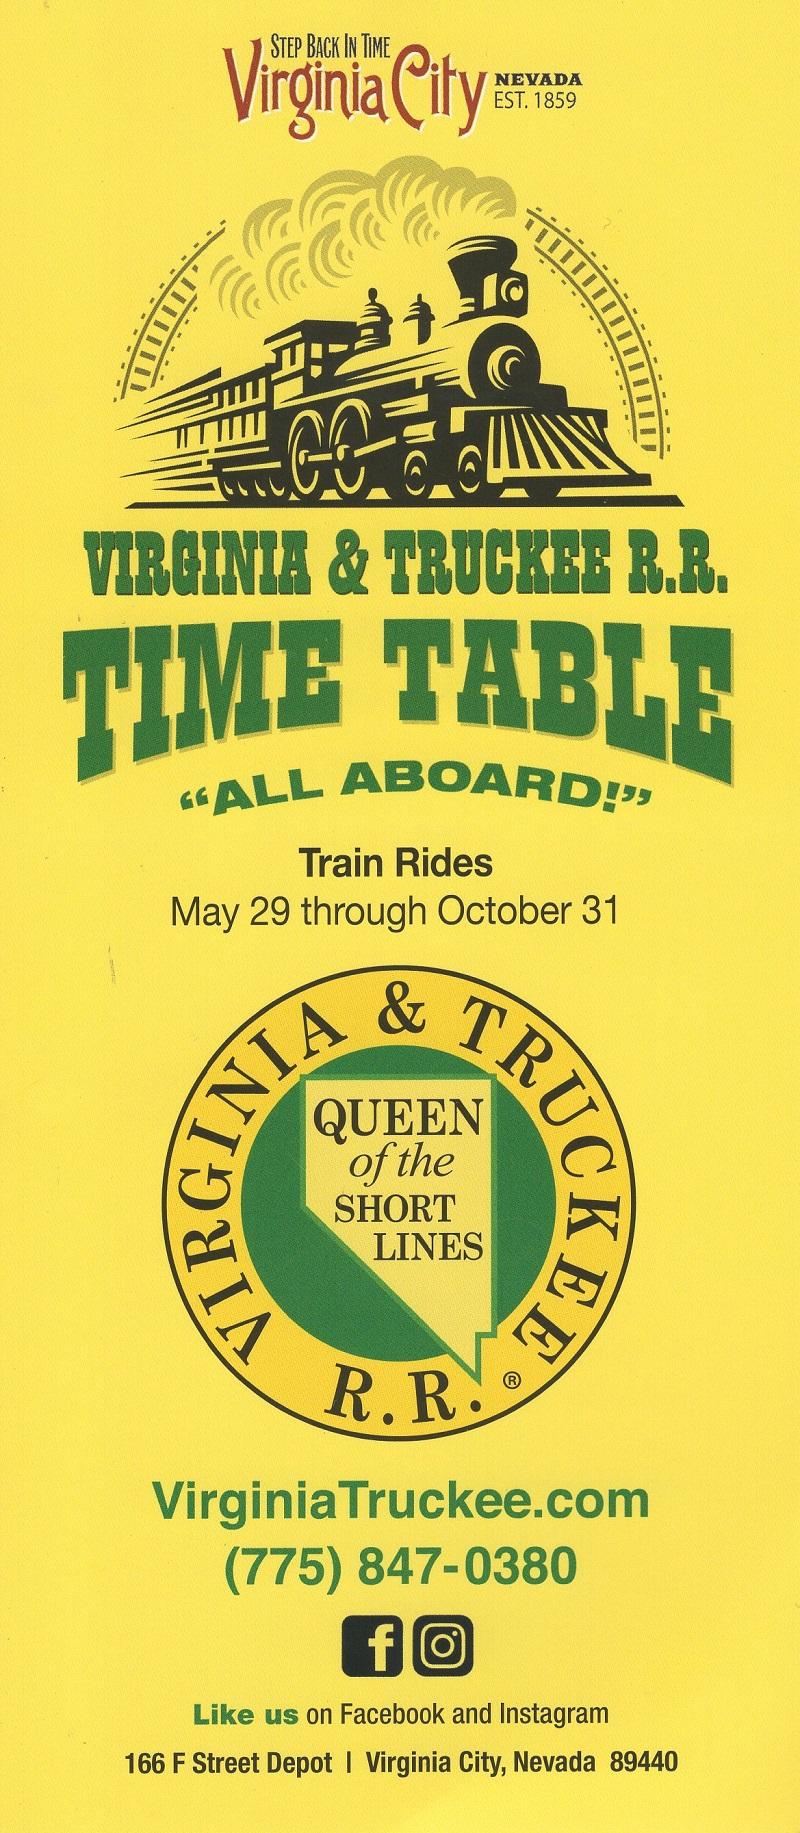 Virginia & Truckee R.R. Time Table